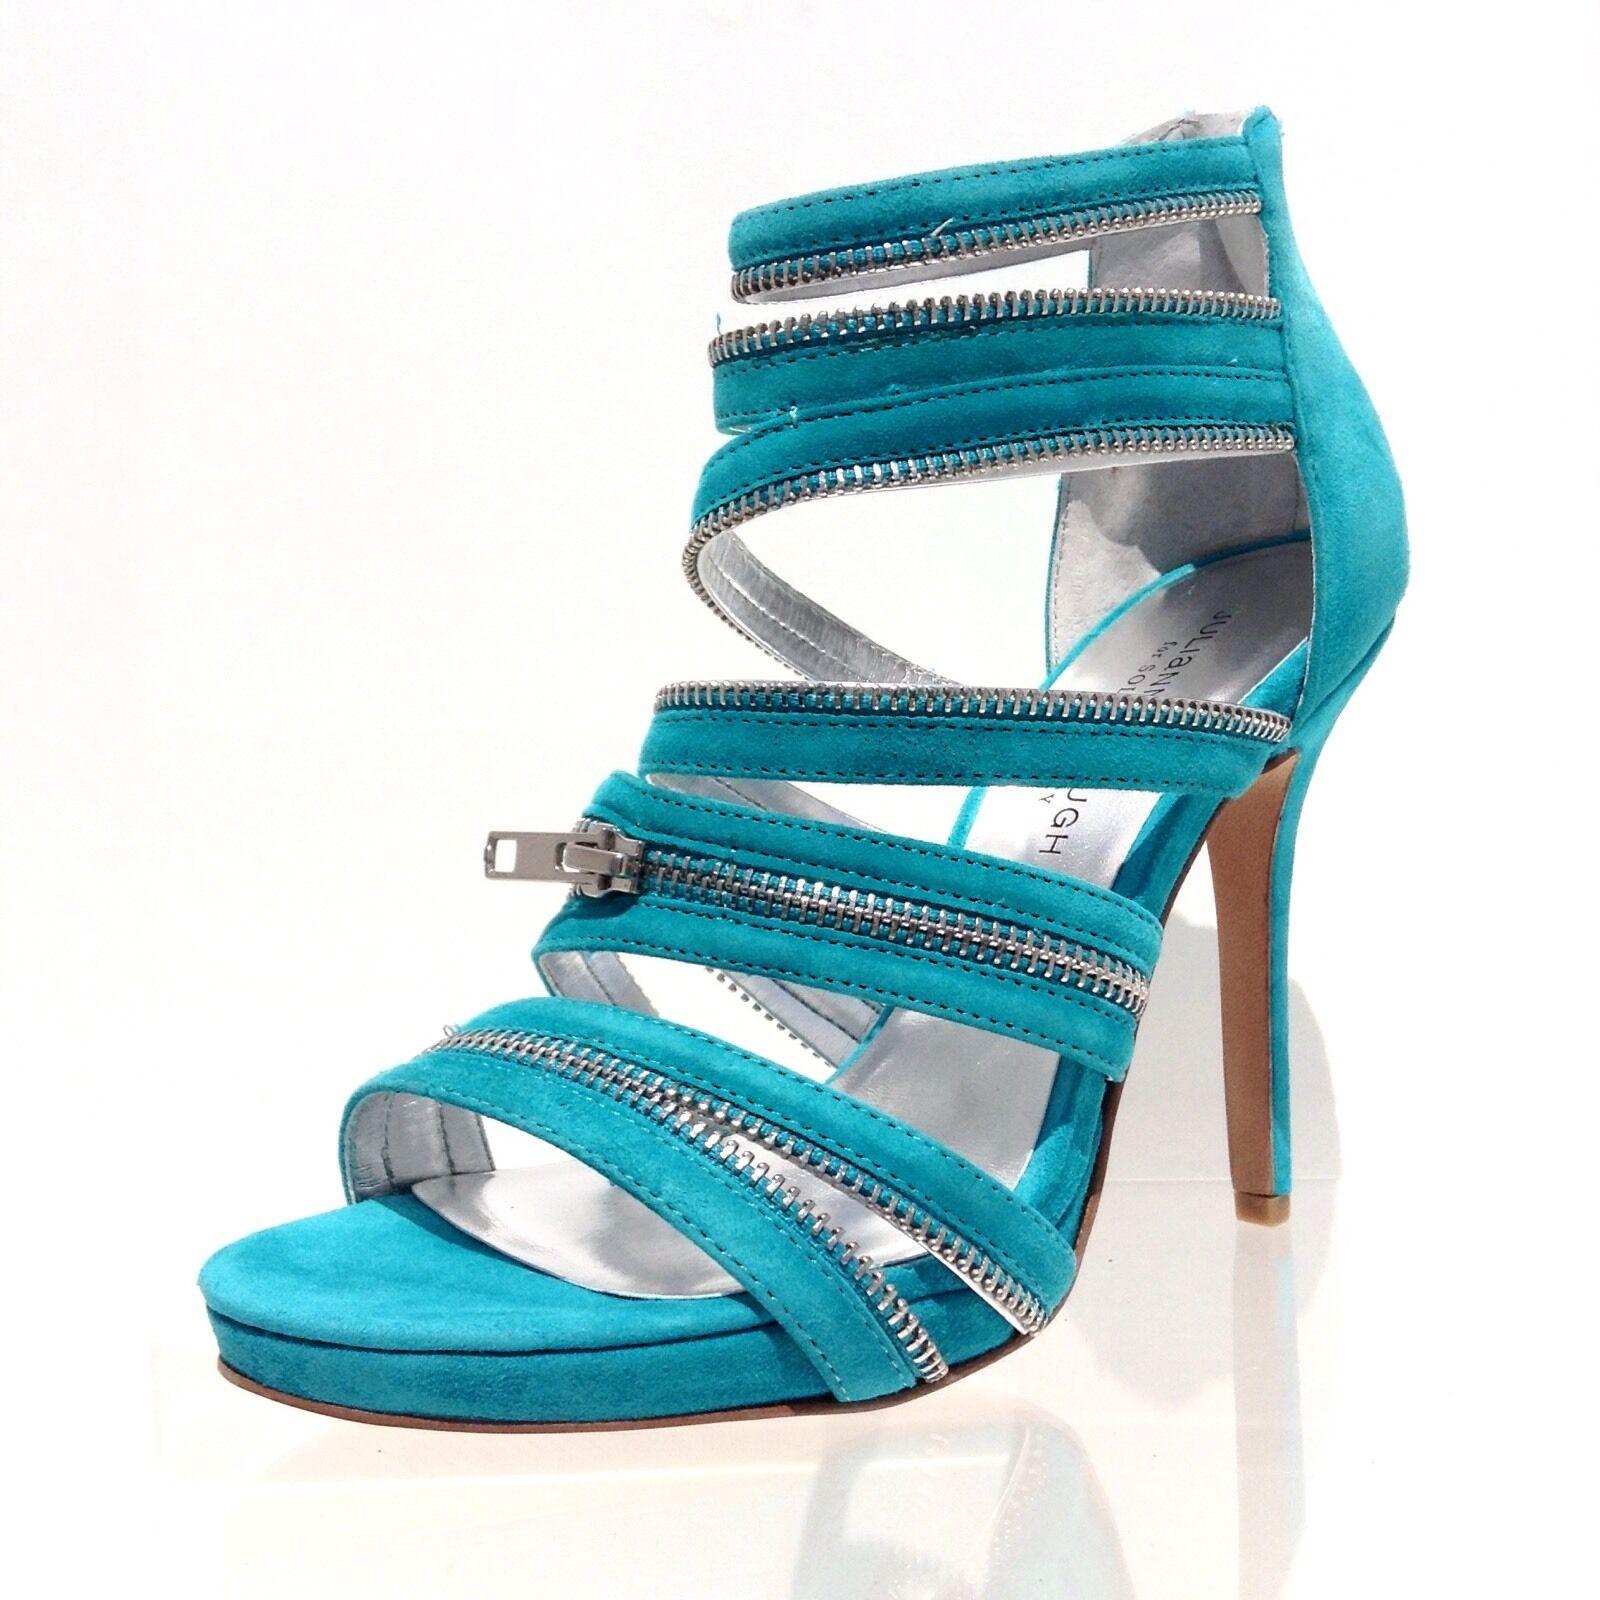 Women's Sole Society Makenna Bermuda bluee Leather Strappy Heels Size 7 M NEW